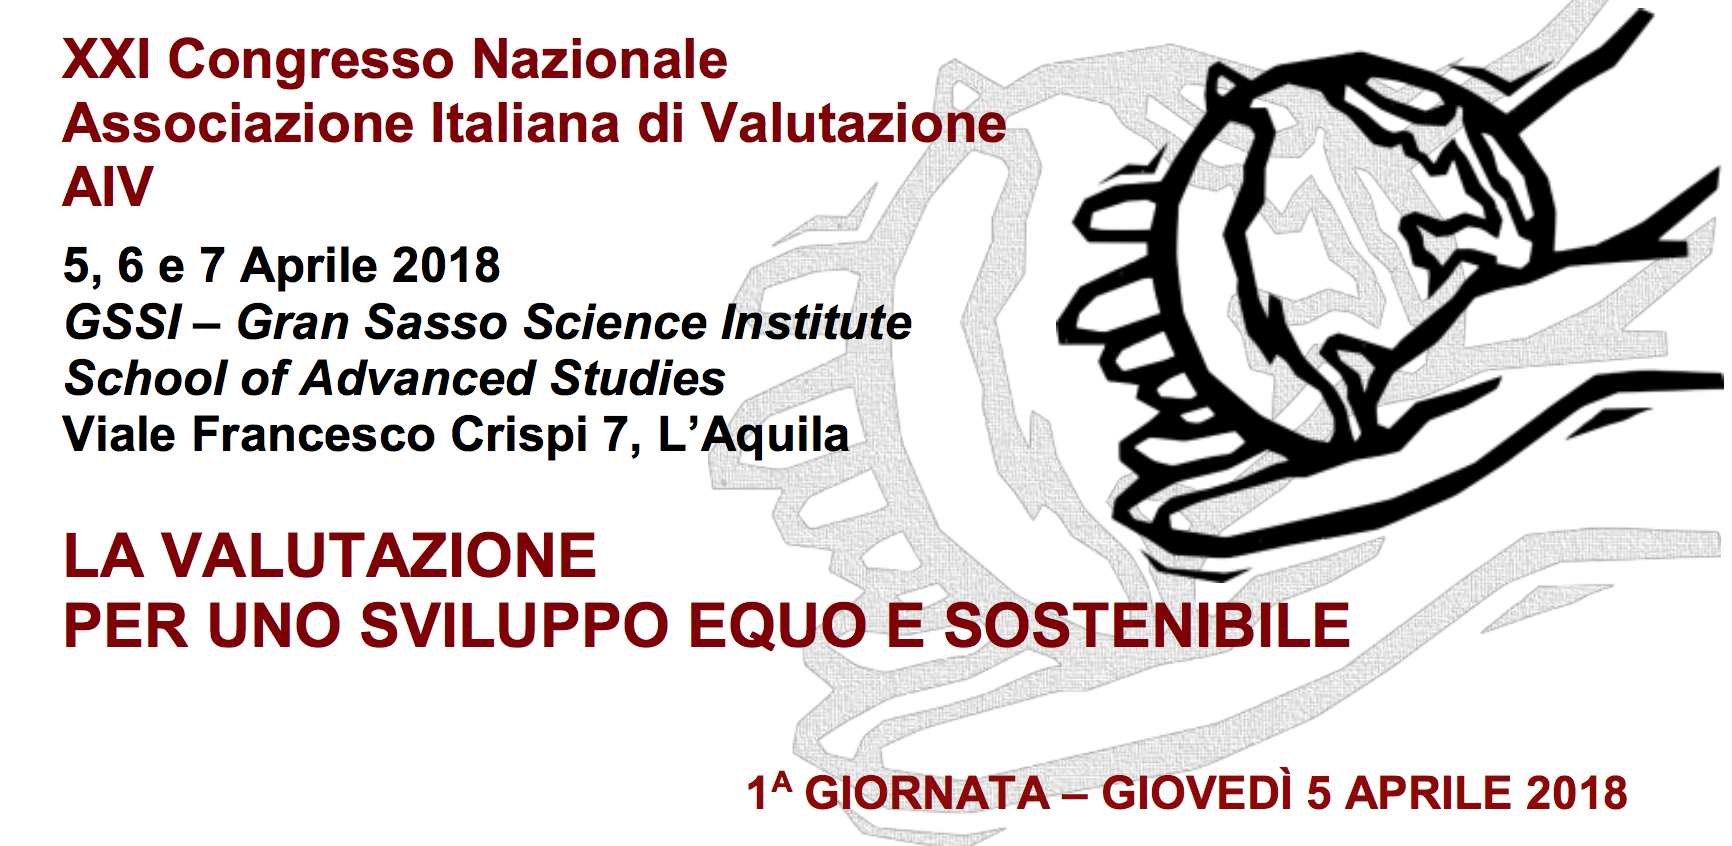 XXI Congresso Nazionale Associazione Italiana di Valutazione AIV